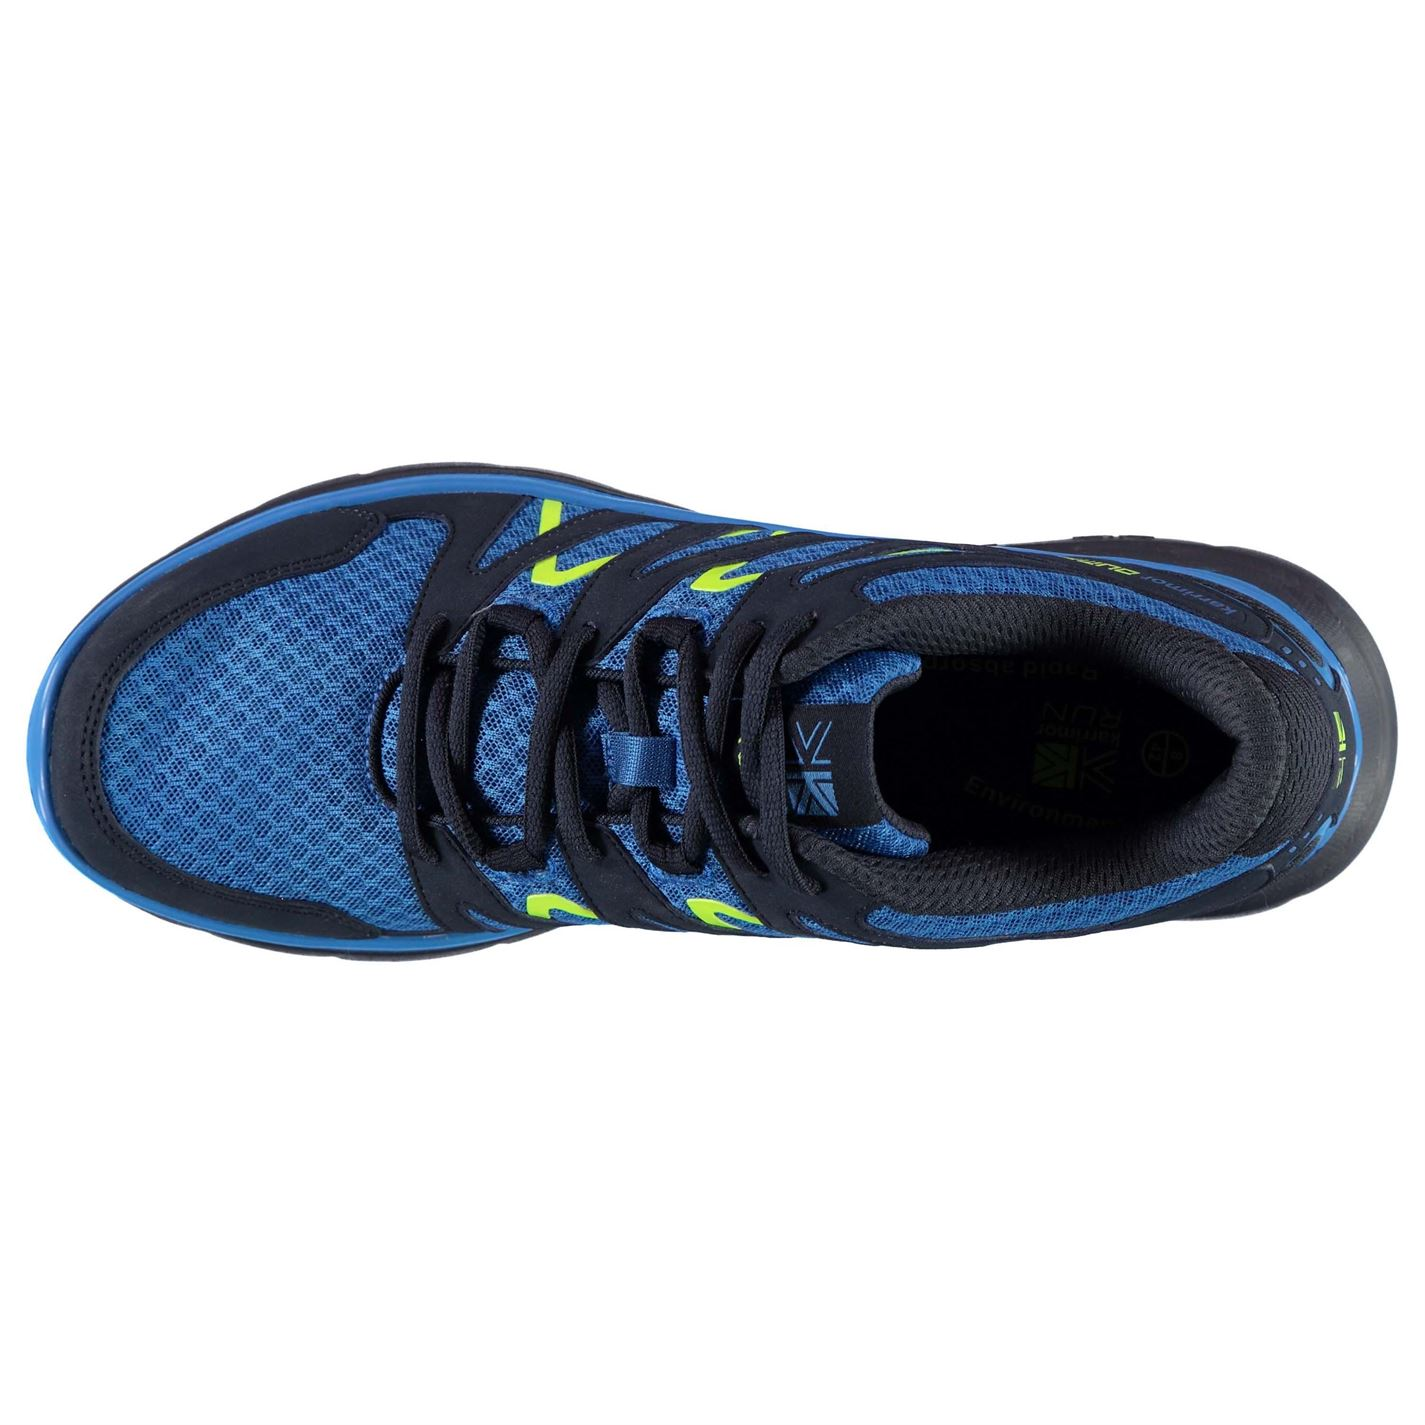 Karrimor-Mens-Duma-Trainers-Lace-Up-Sports-Running-Cross-Training-Shoes thumbnail 51